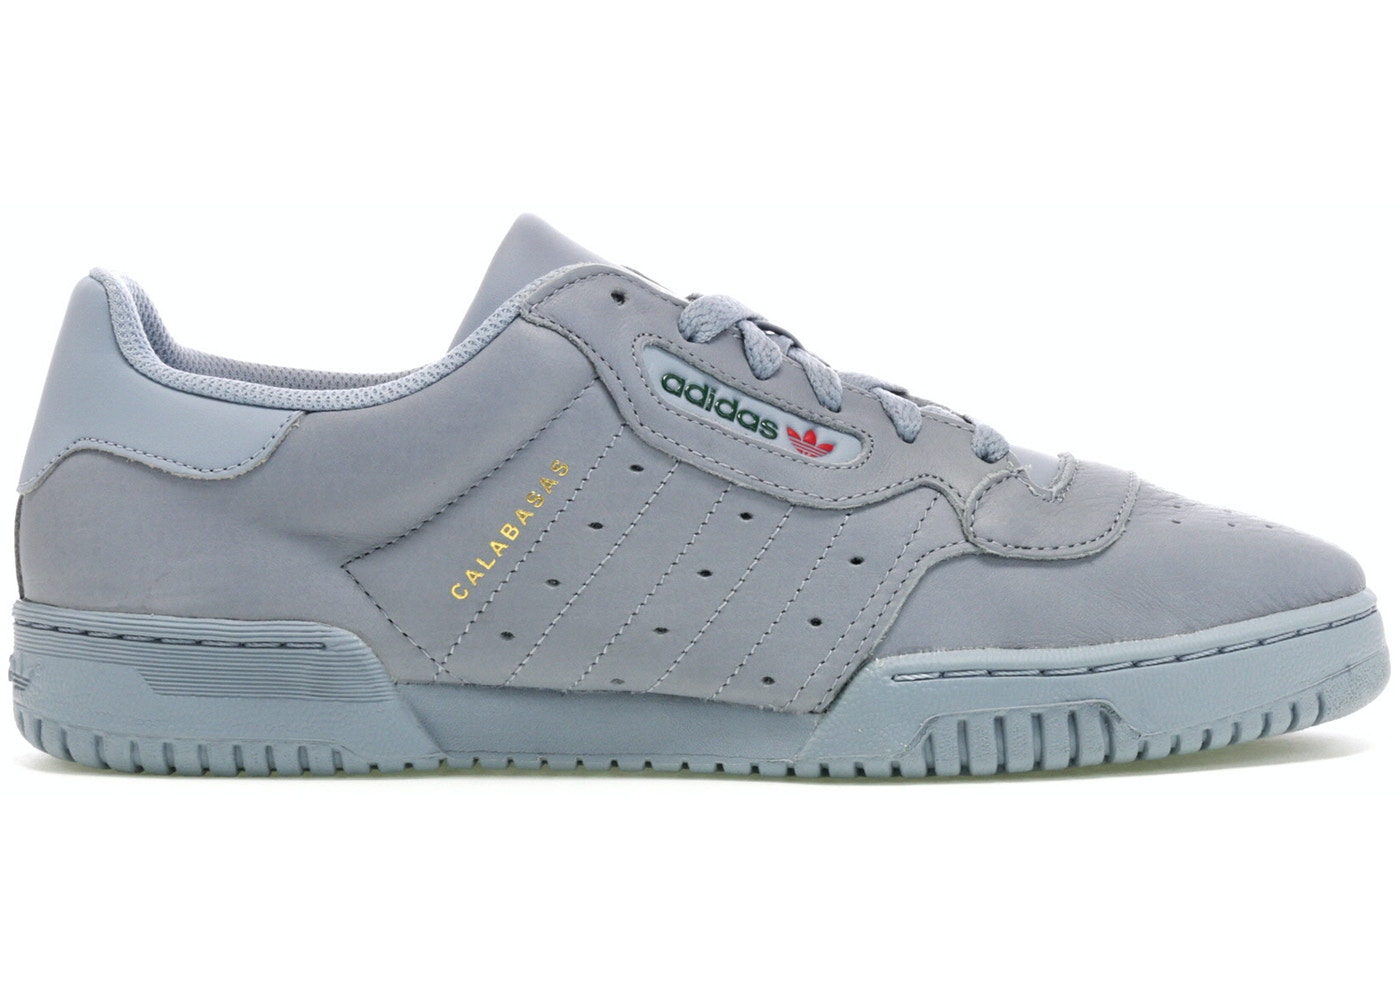 new style 8dff1 77bf4 adidas Yeezy Powerphase Calabasas Grey - CG6422